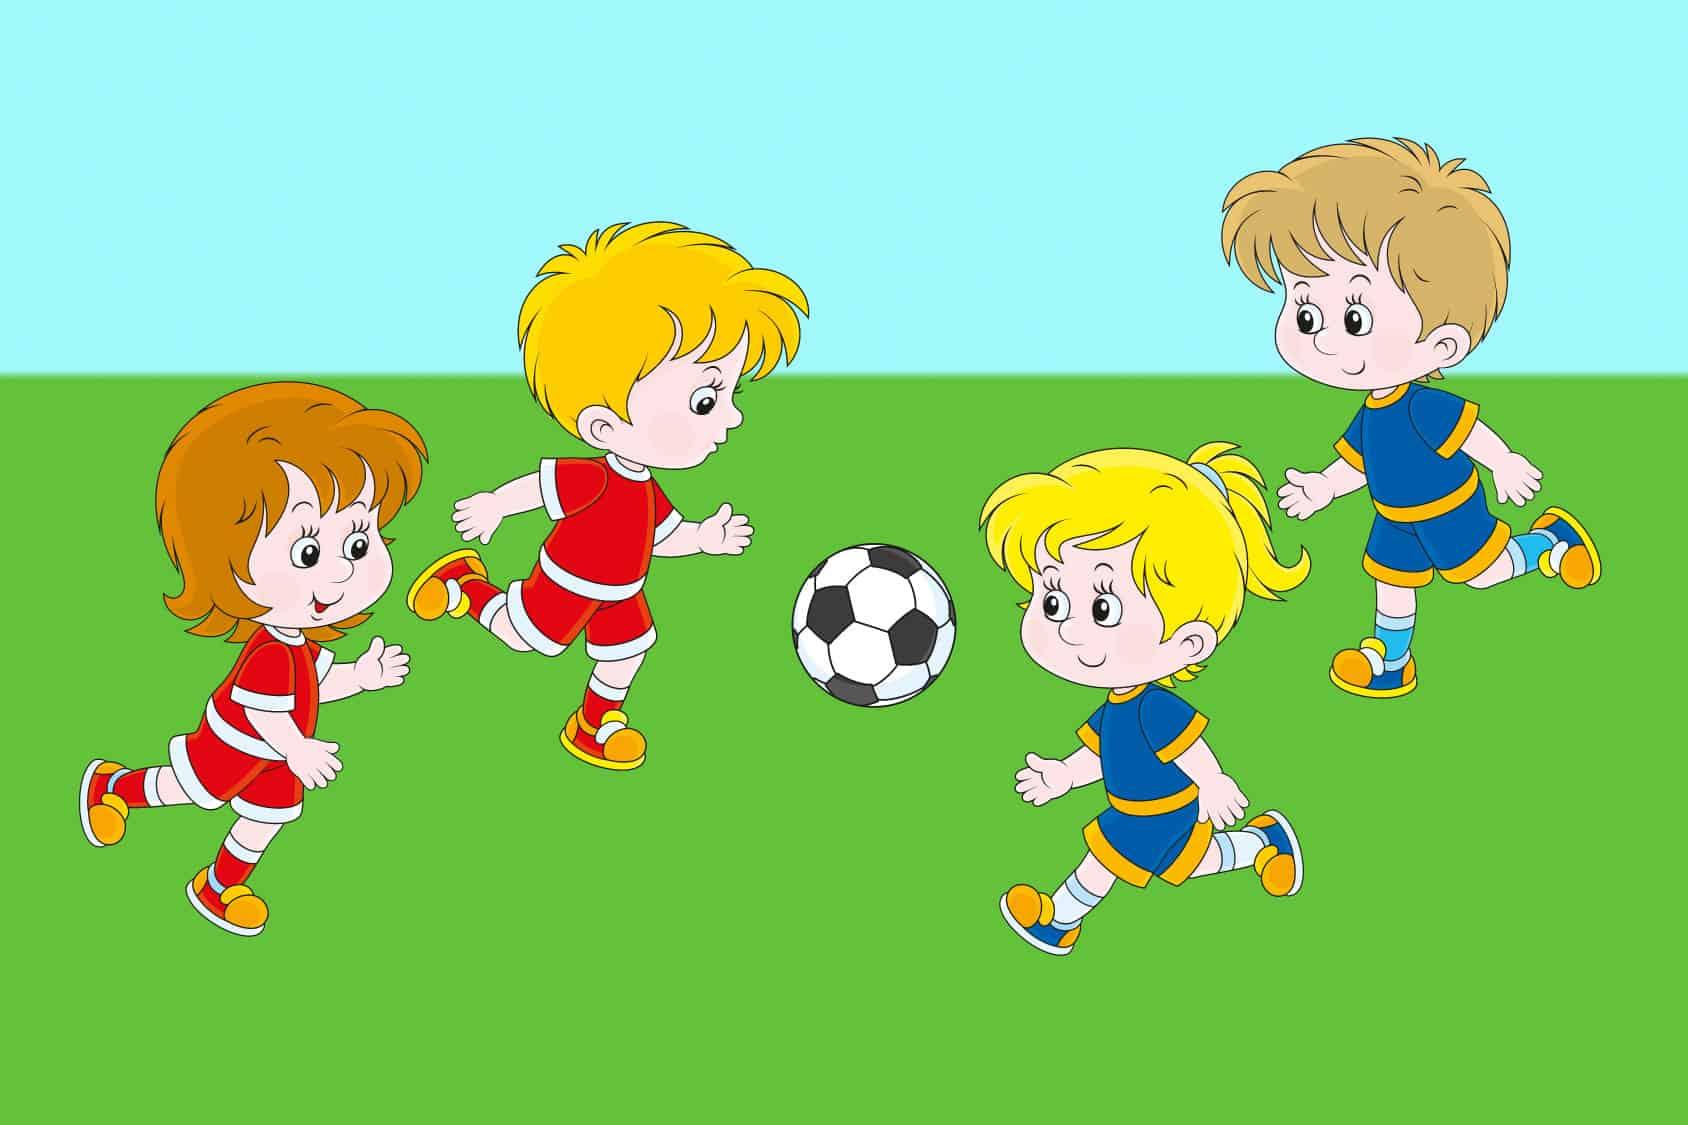 Kleurplaten Voetbal Poppetjes.Kleurplaat Voetbal Download 28 Leukste Voetbal Kleurplaten